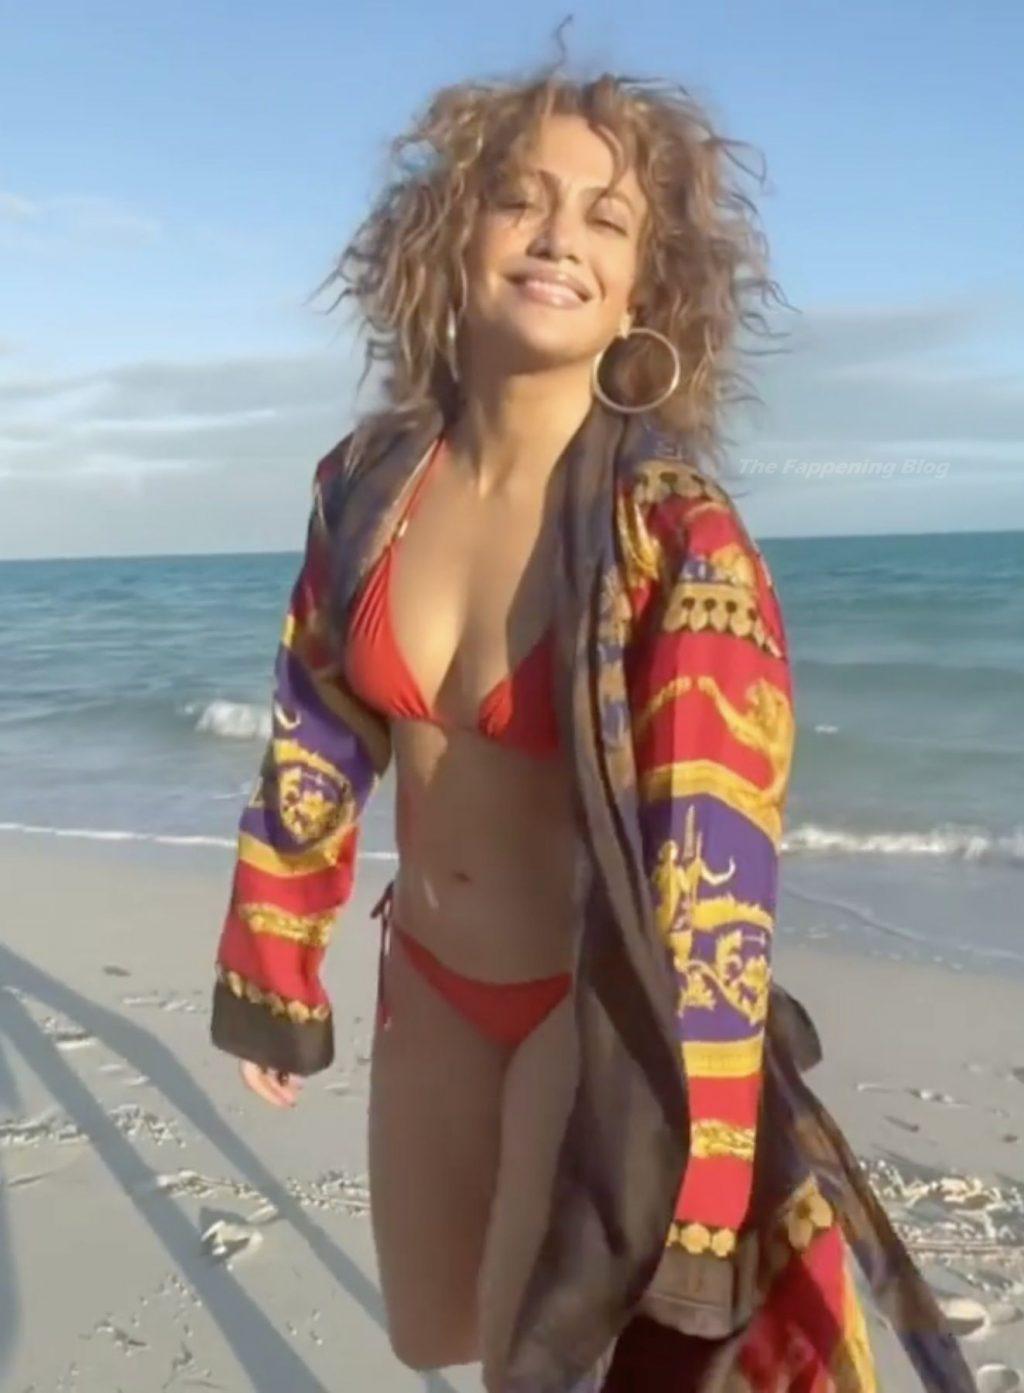 Jennifer Lopez Hits the Beach in a Red Bikini (12 Pics + Video)